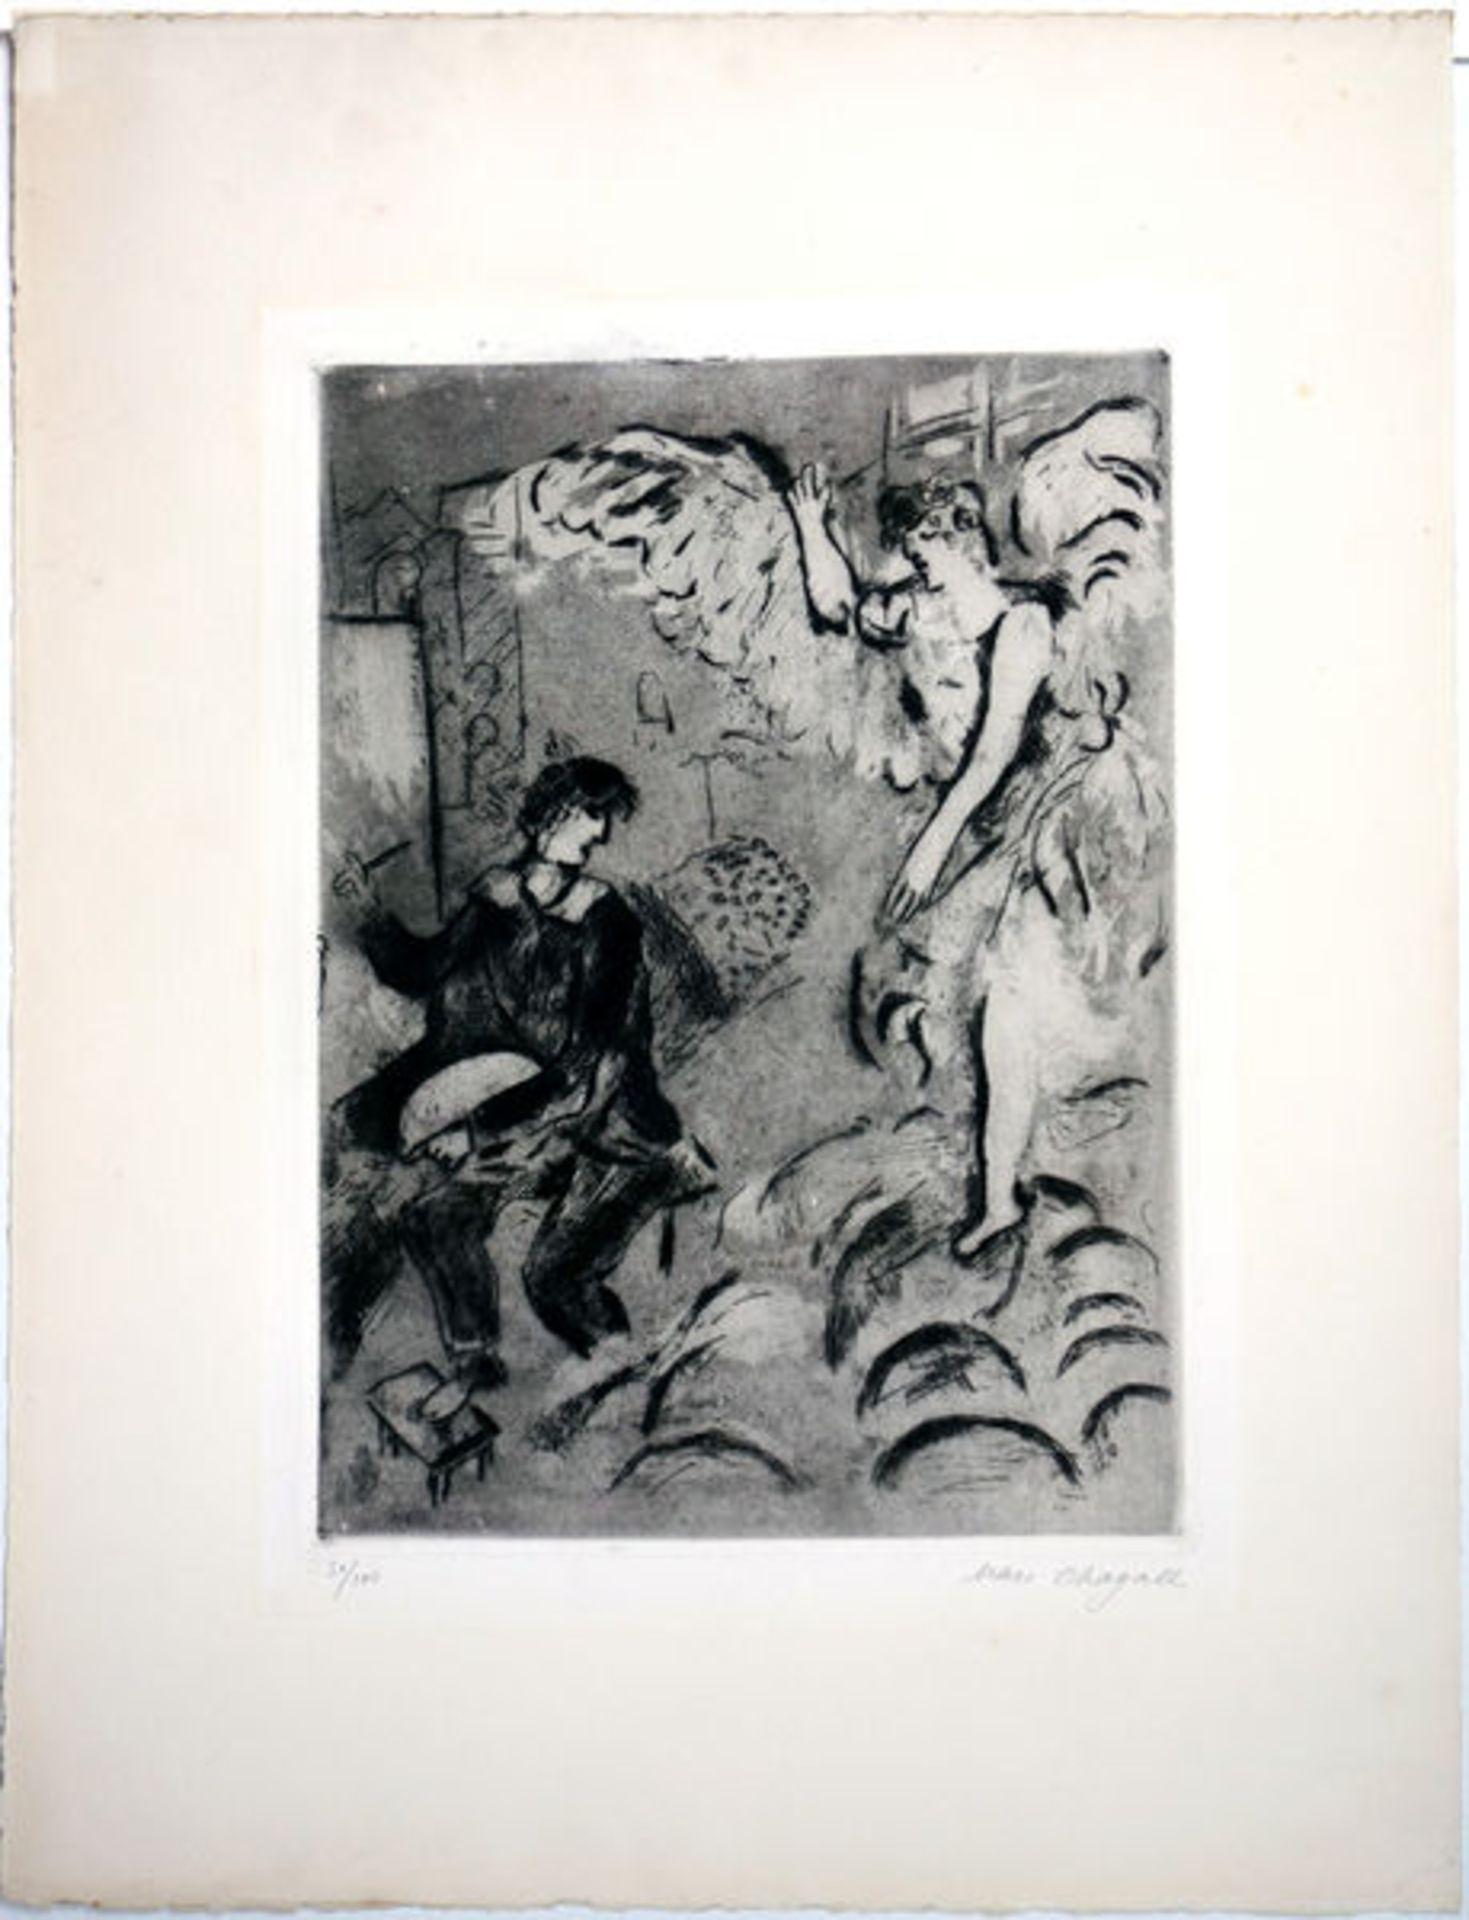 Chagall, MarcRadierung und Aquatinta auf Arches Bütten, 37,4 x 27,5 cmL'Apparition I (1924)